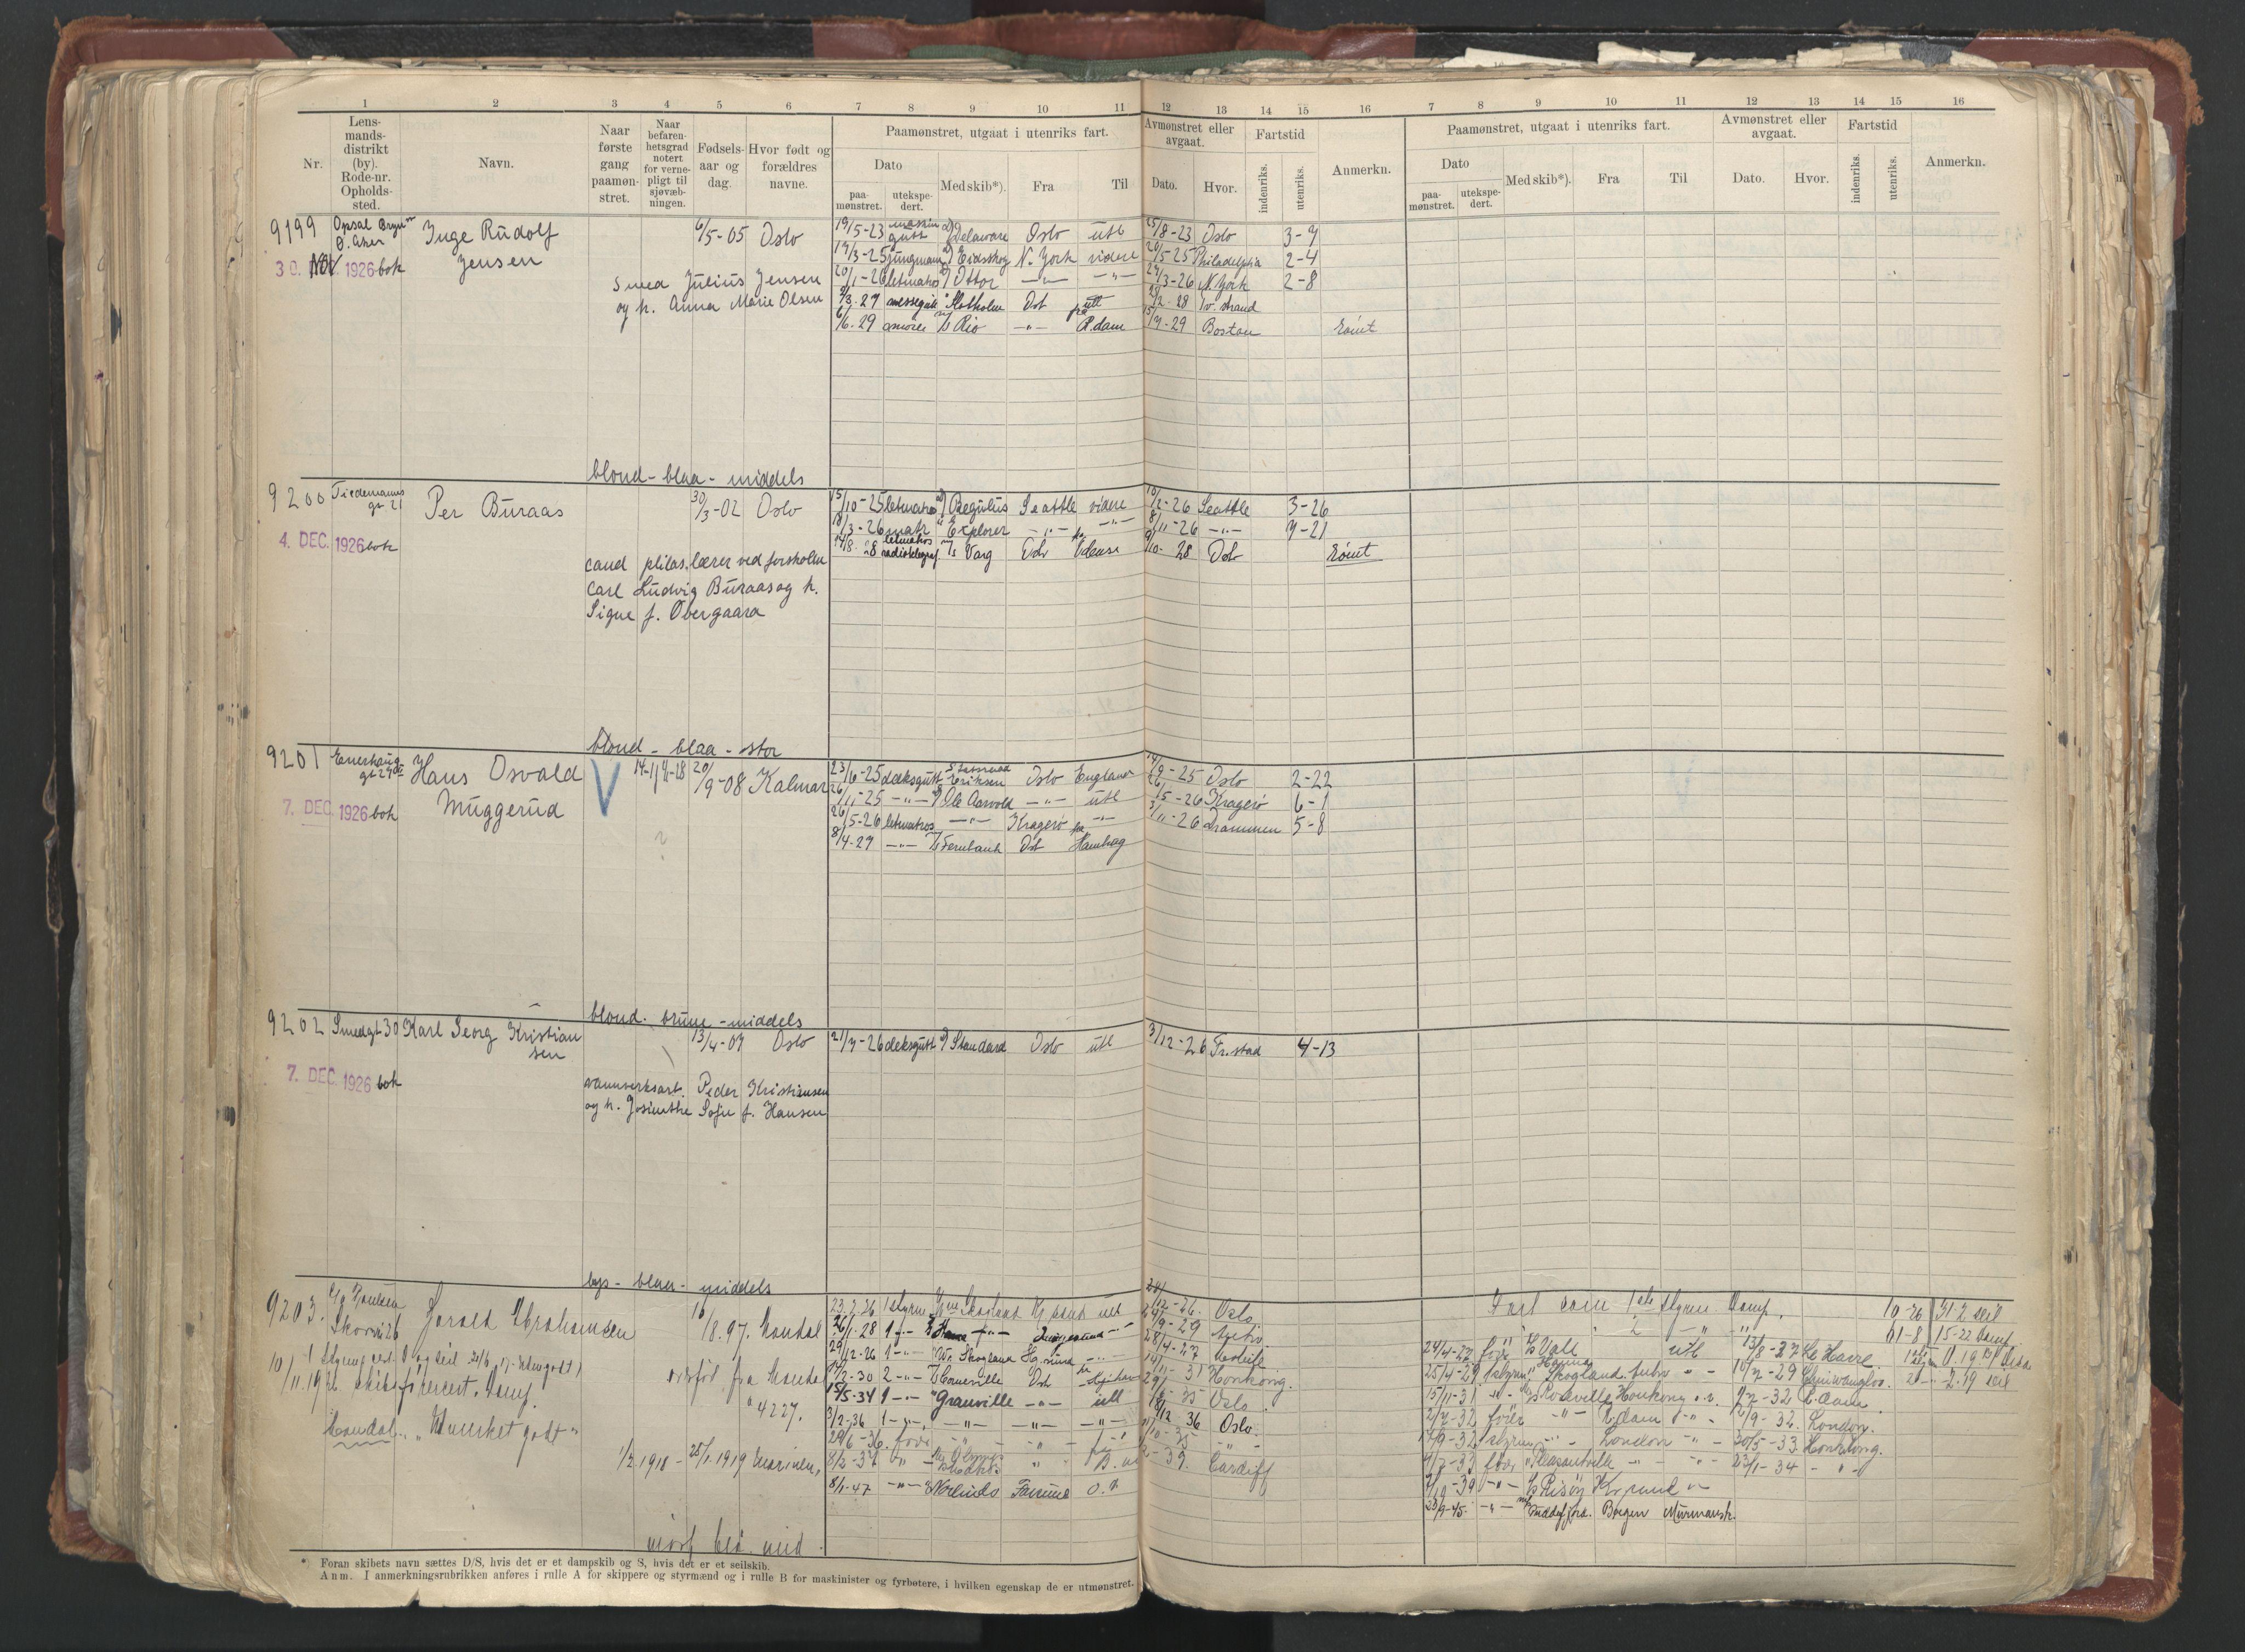 SAO, Oslo sjømannskontor, F/Fc/L0006: Hovedrulle, 1918-1930, s. 333